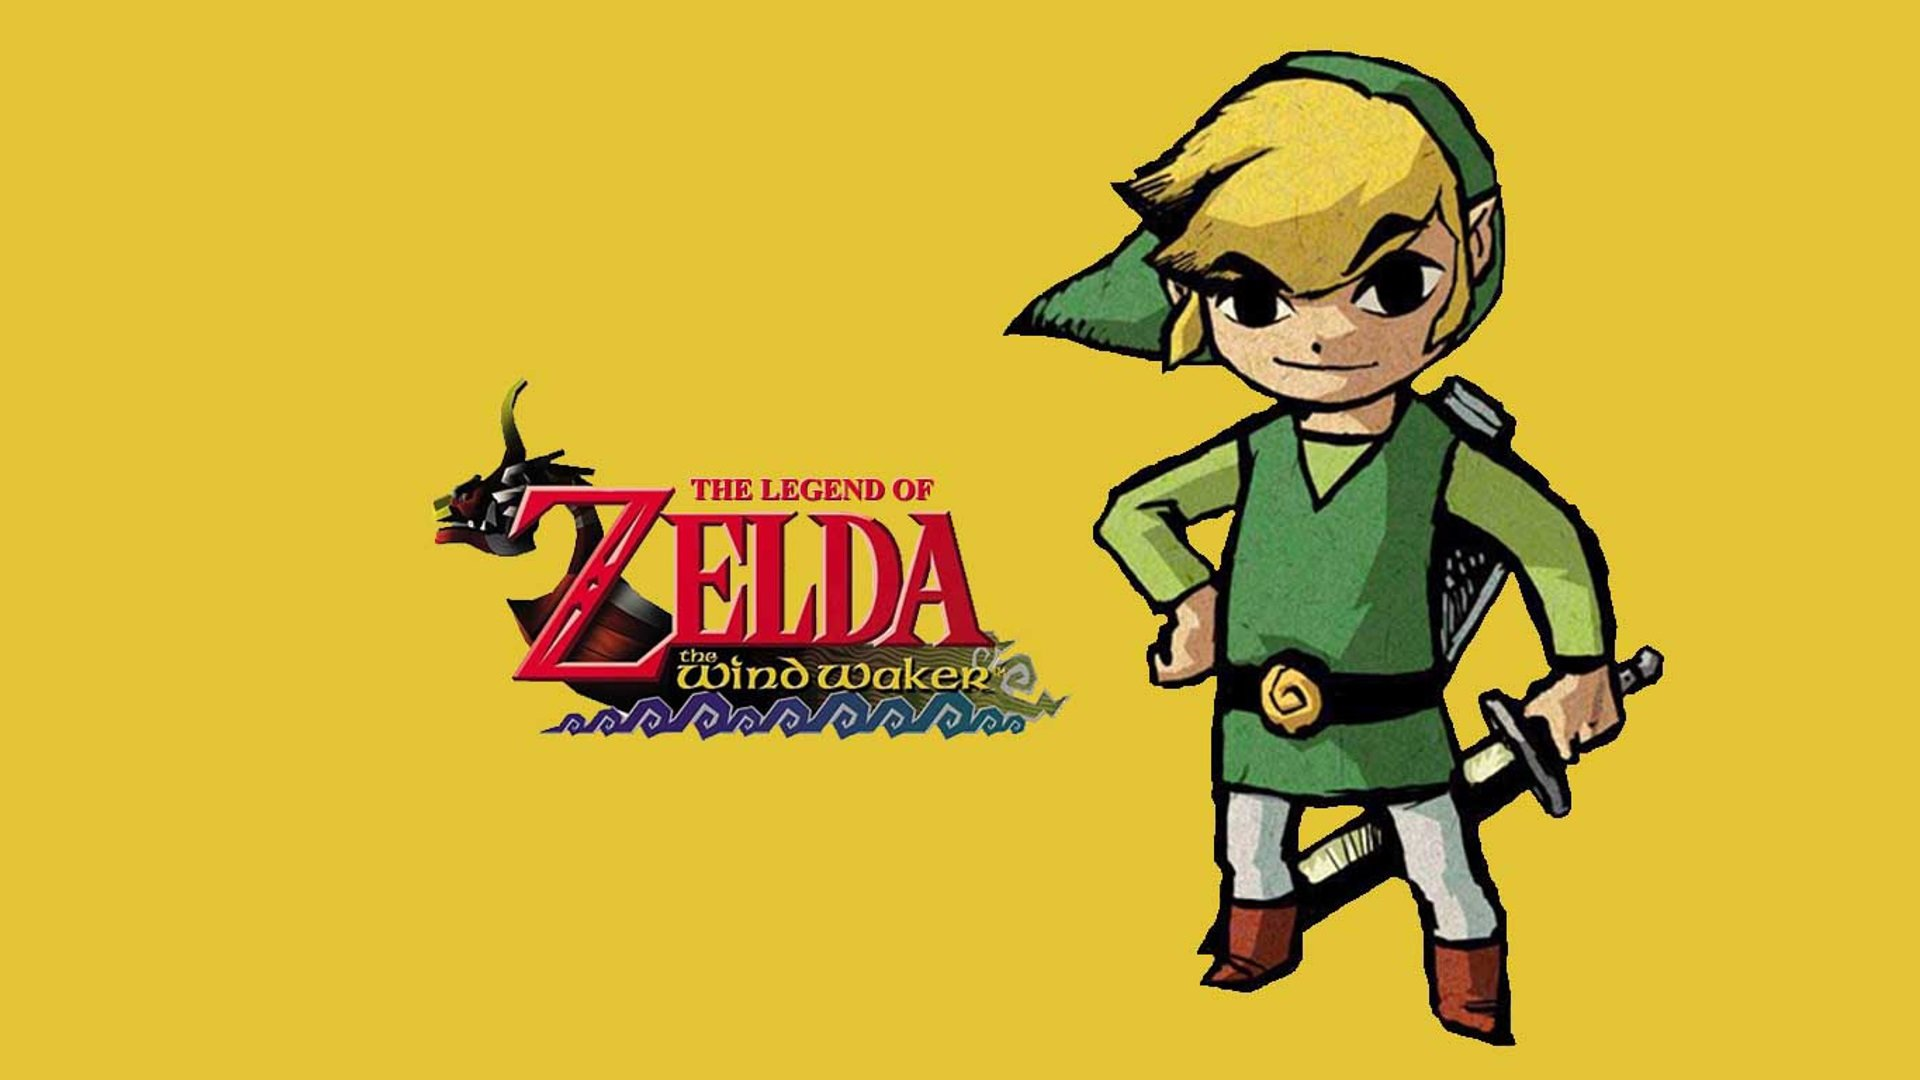 Download Hd 1920x1080 The Legend Of Zelda The Wind Waker